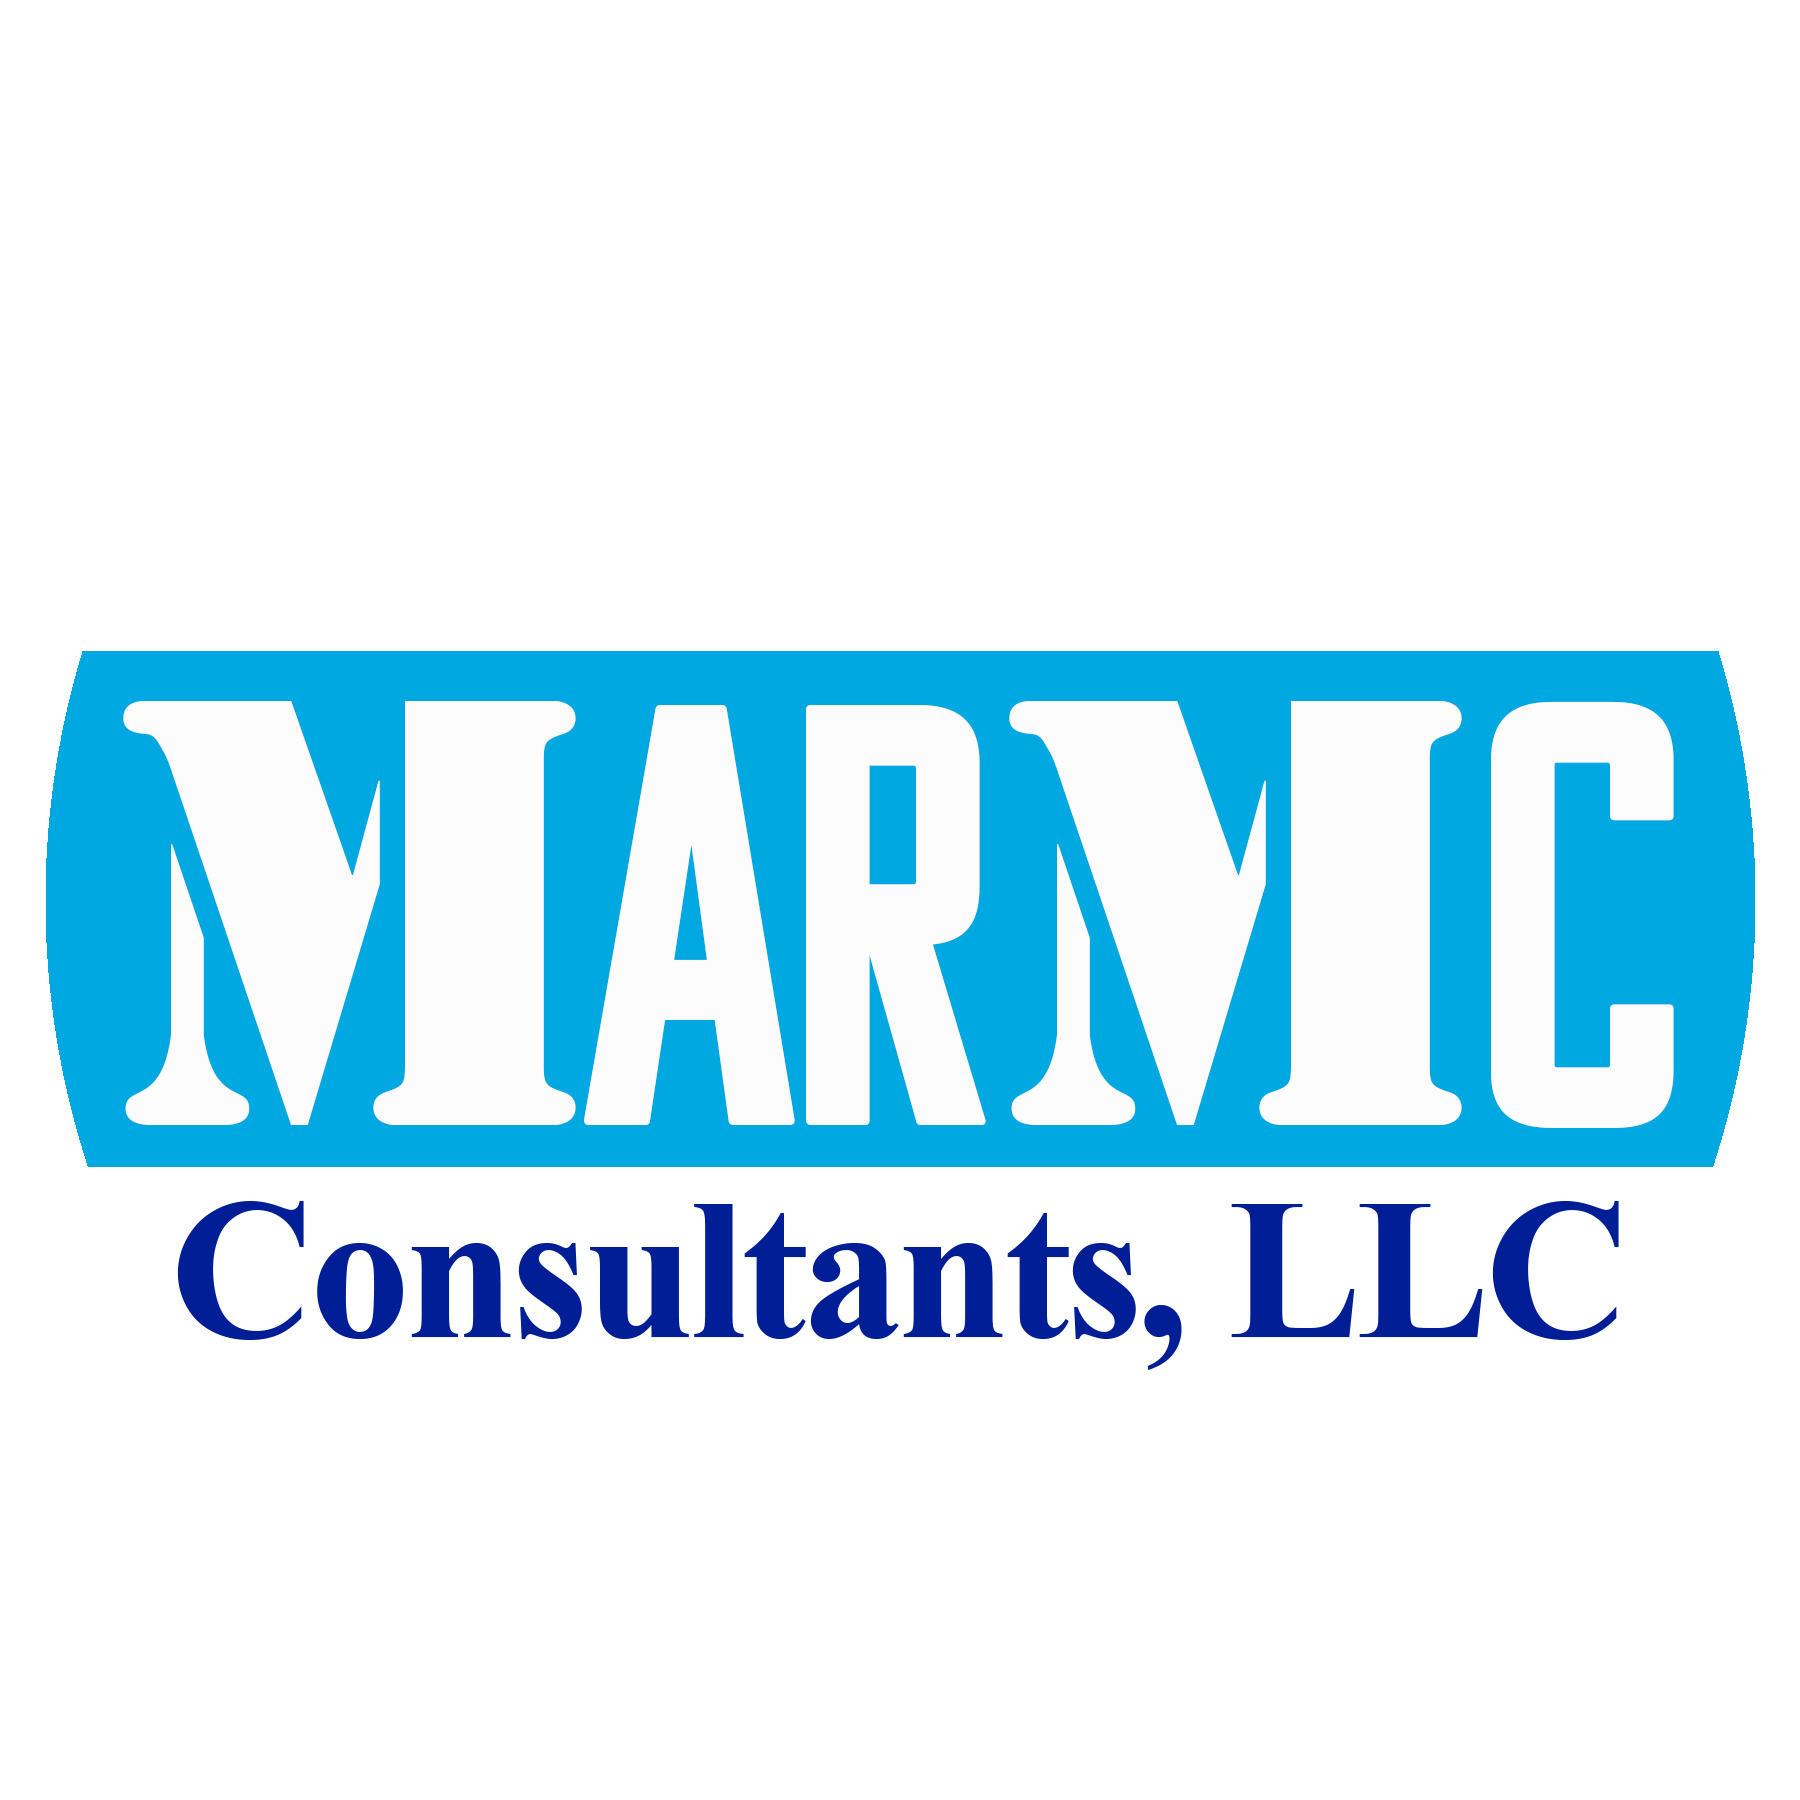 MARMC Consultants